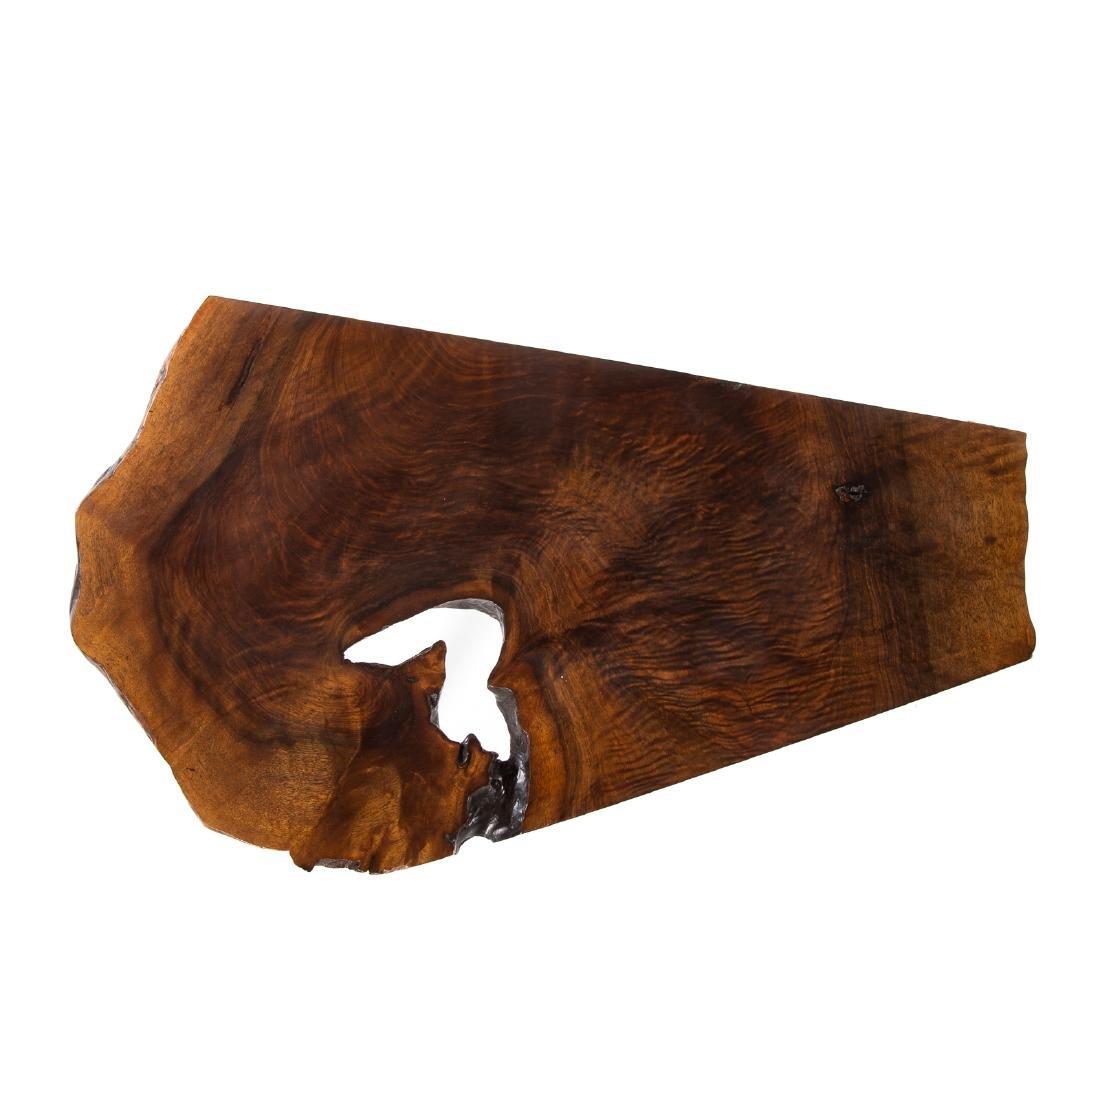 George Nakashima Slab Side Table - 3